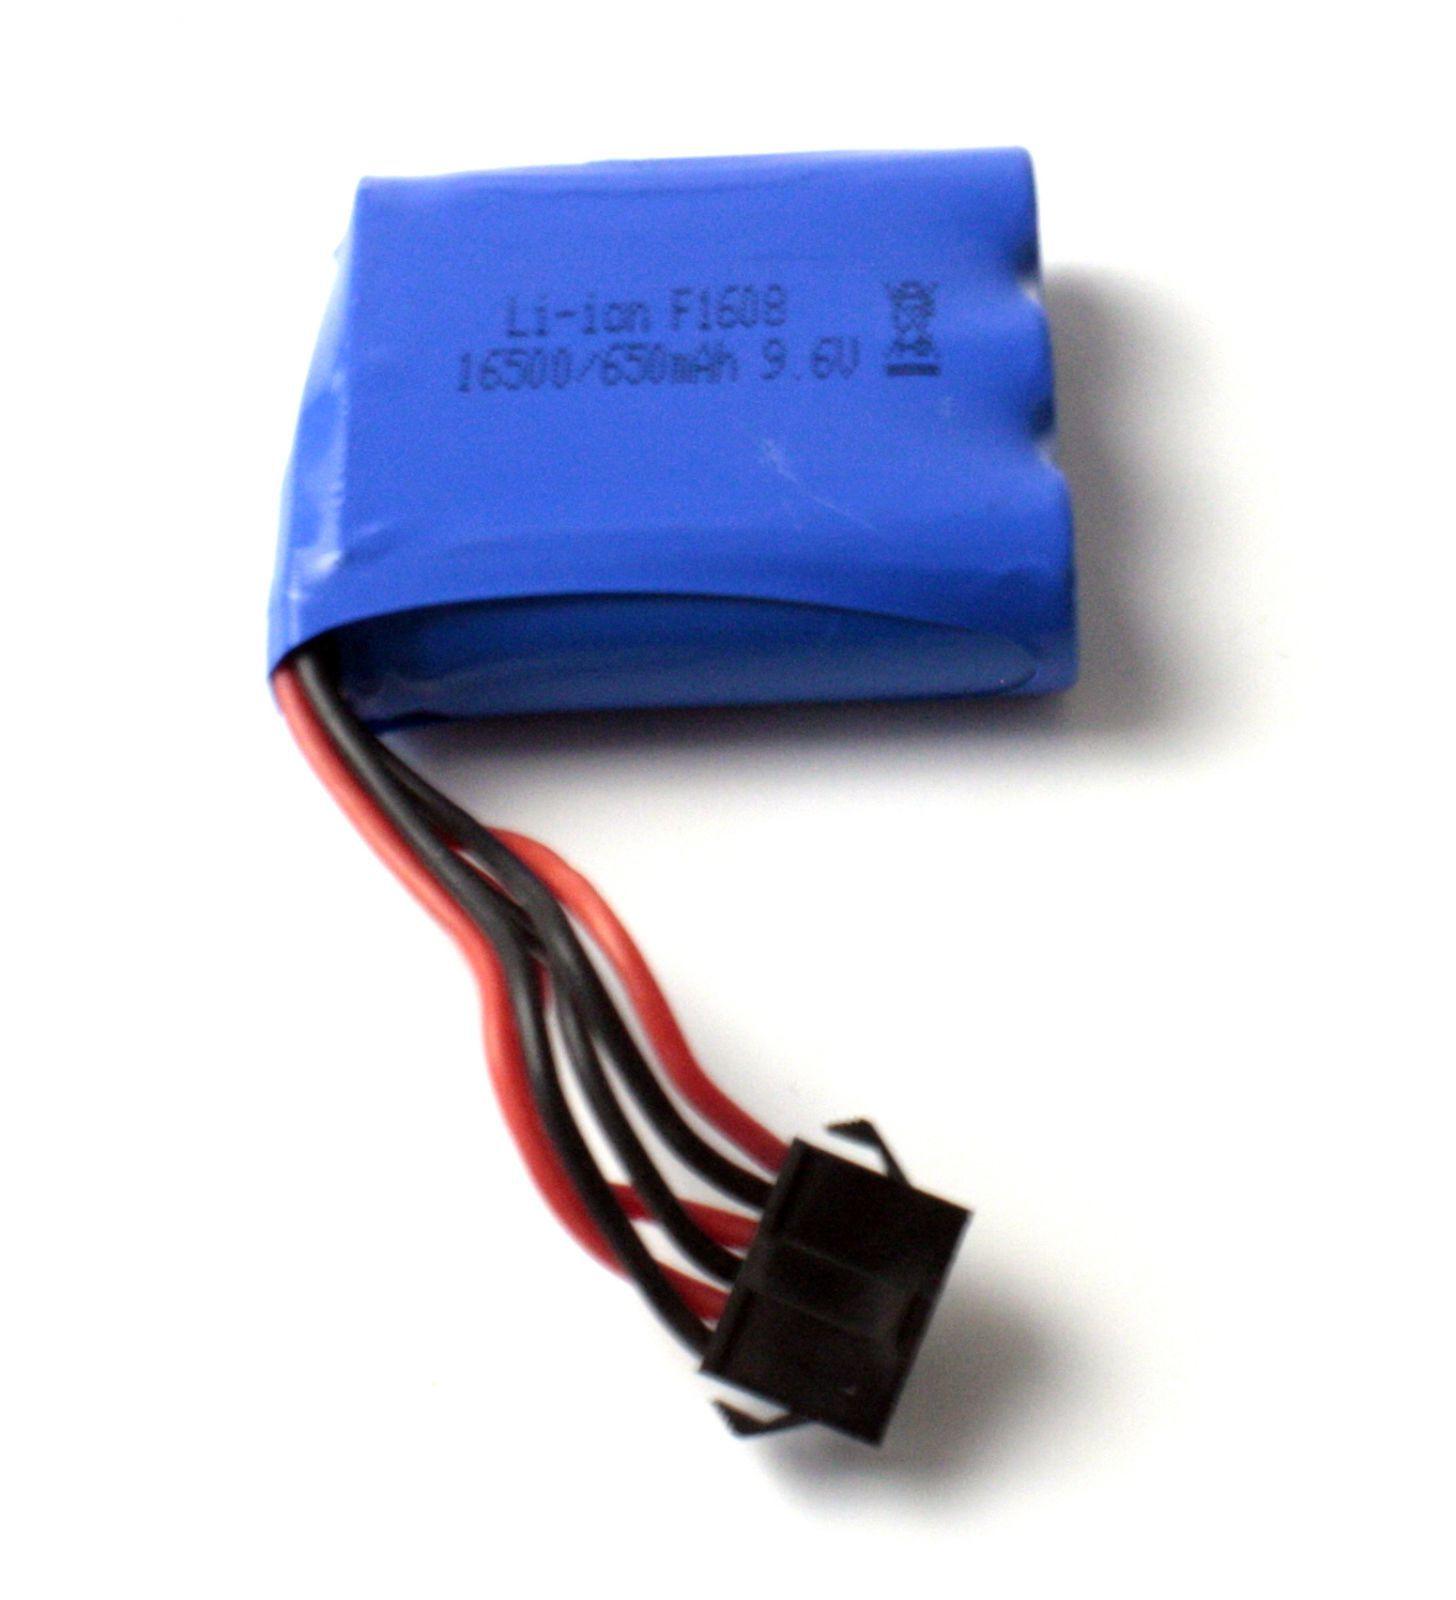 Baterií 9.6V 650mAh